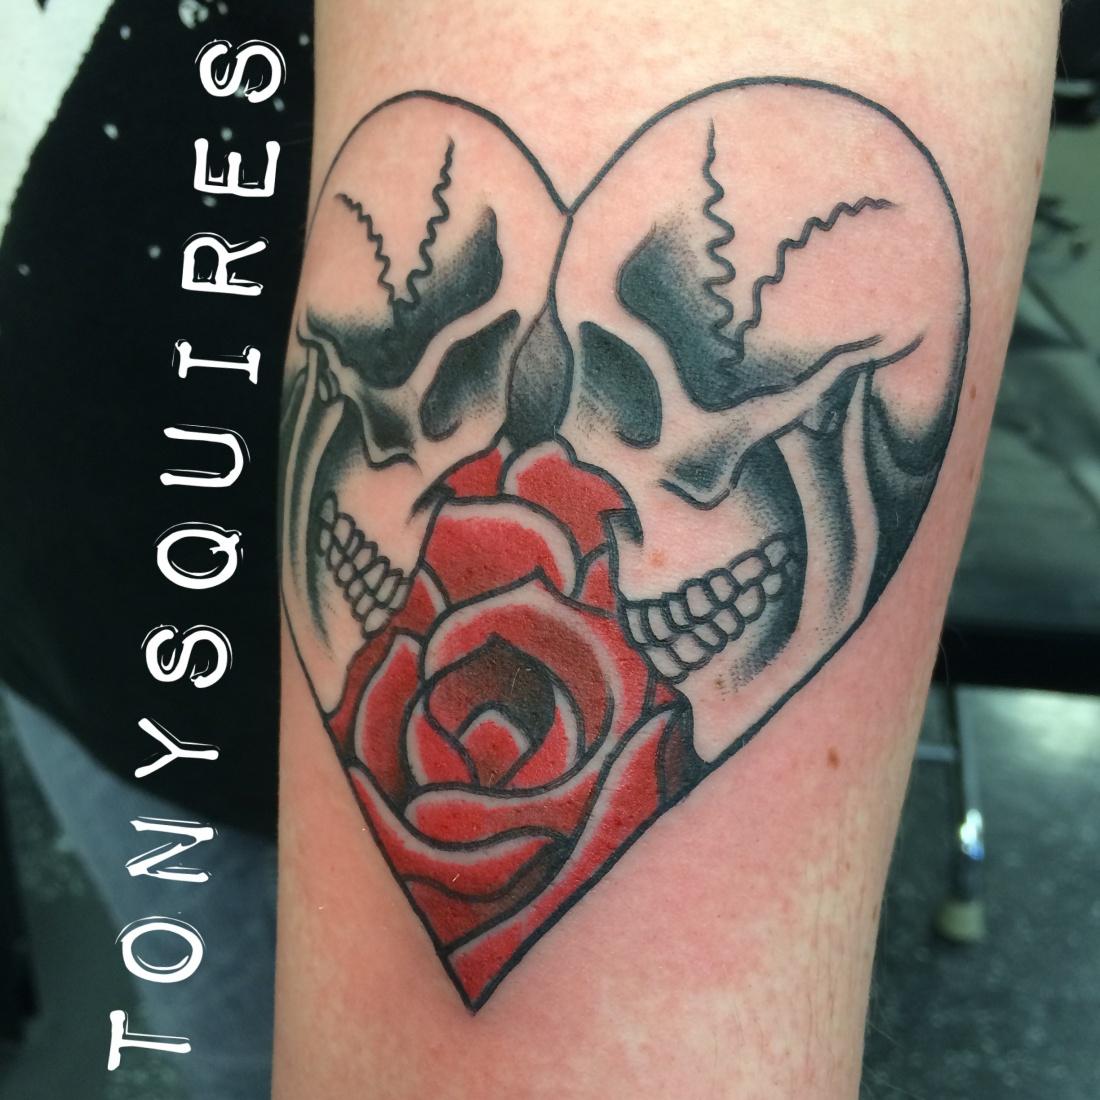 Tattoo Designs Dedicated To Wife: Iron Brush Tattoo